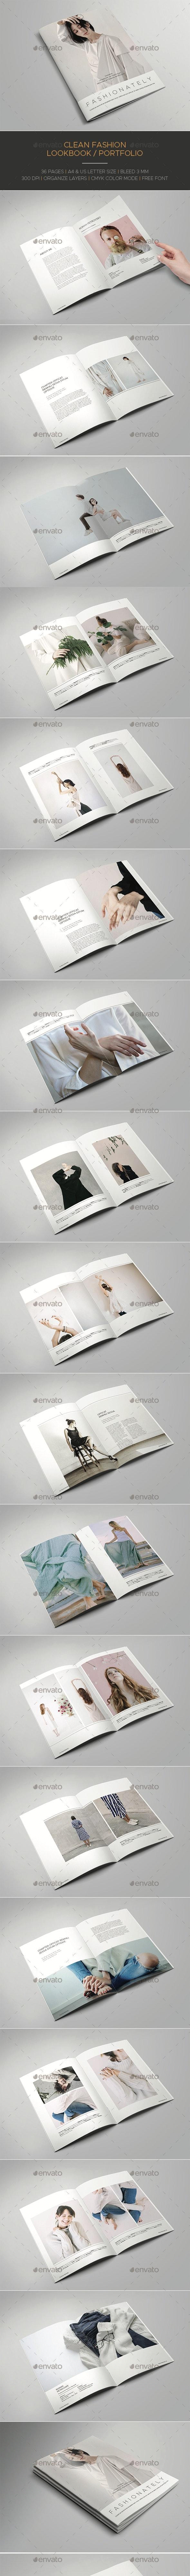 Clean Fashion Lookbook/Portfolio - Catalogs Brochures